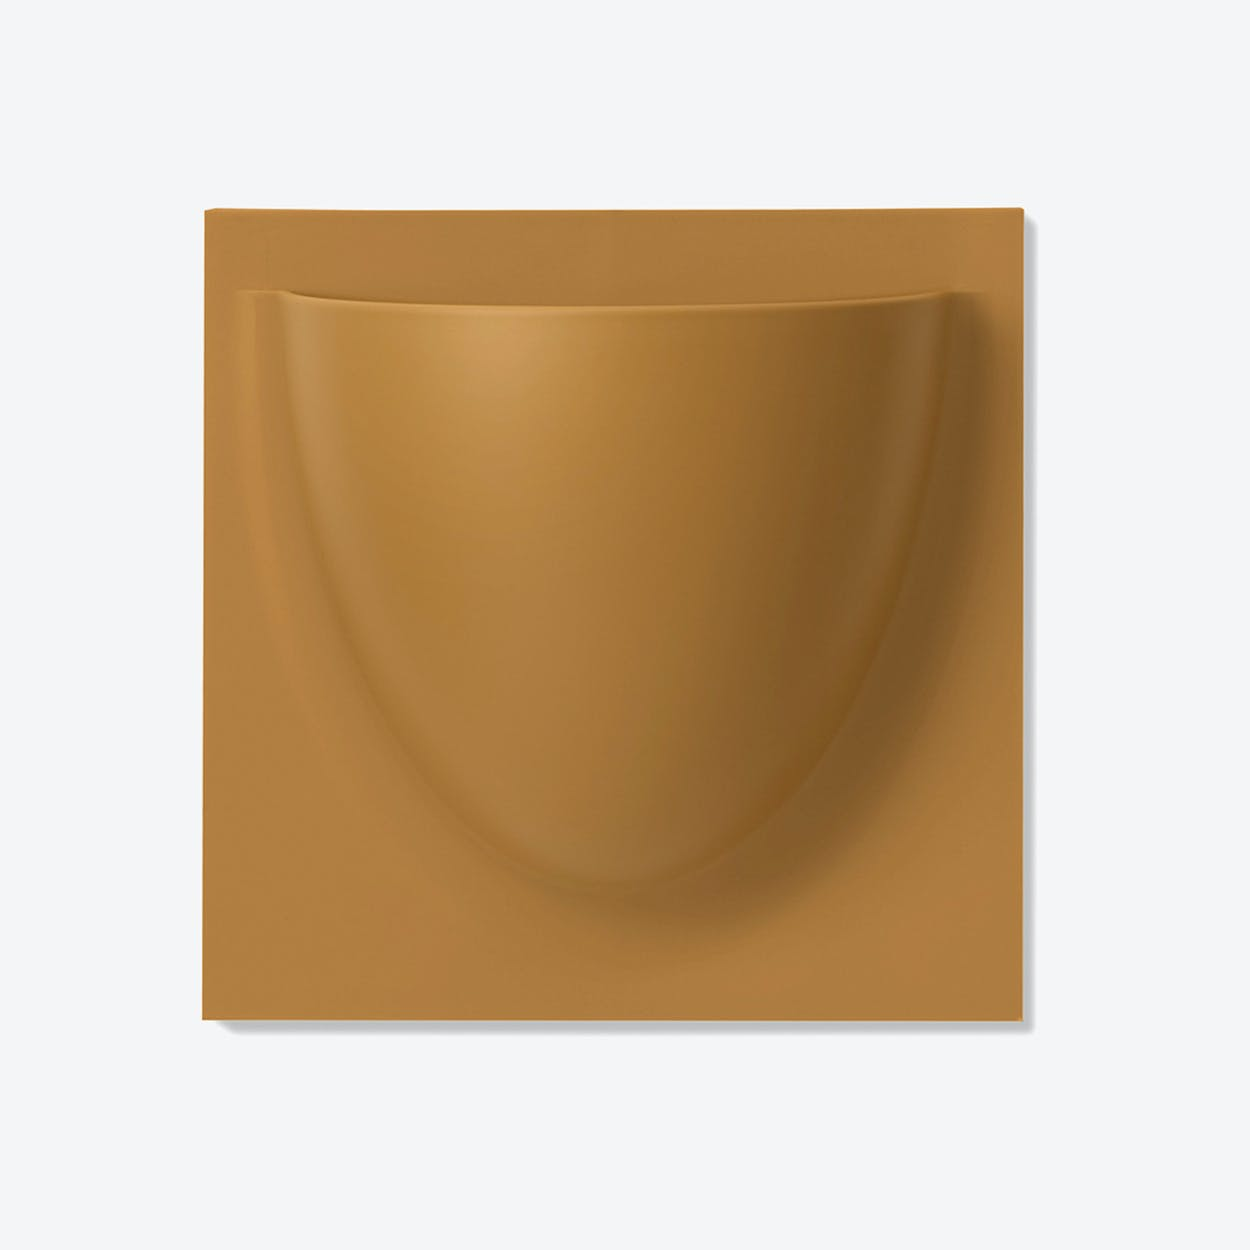 Wall Planter / Jar in Brown Beige